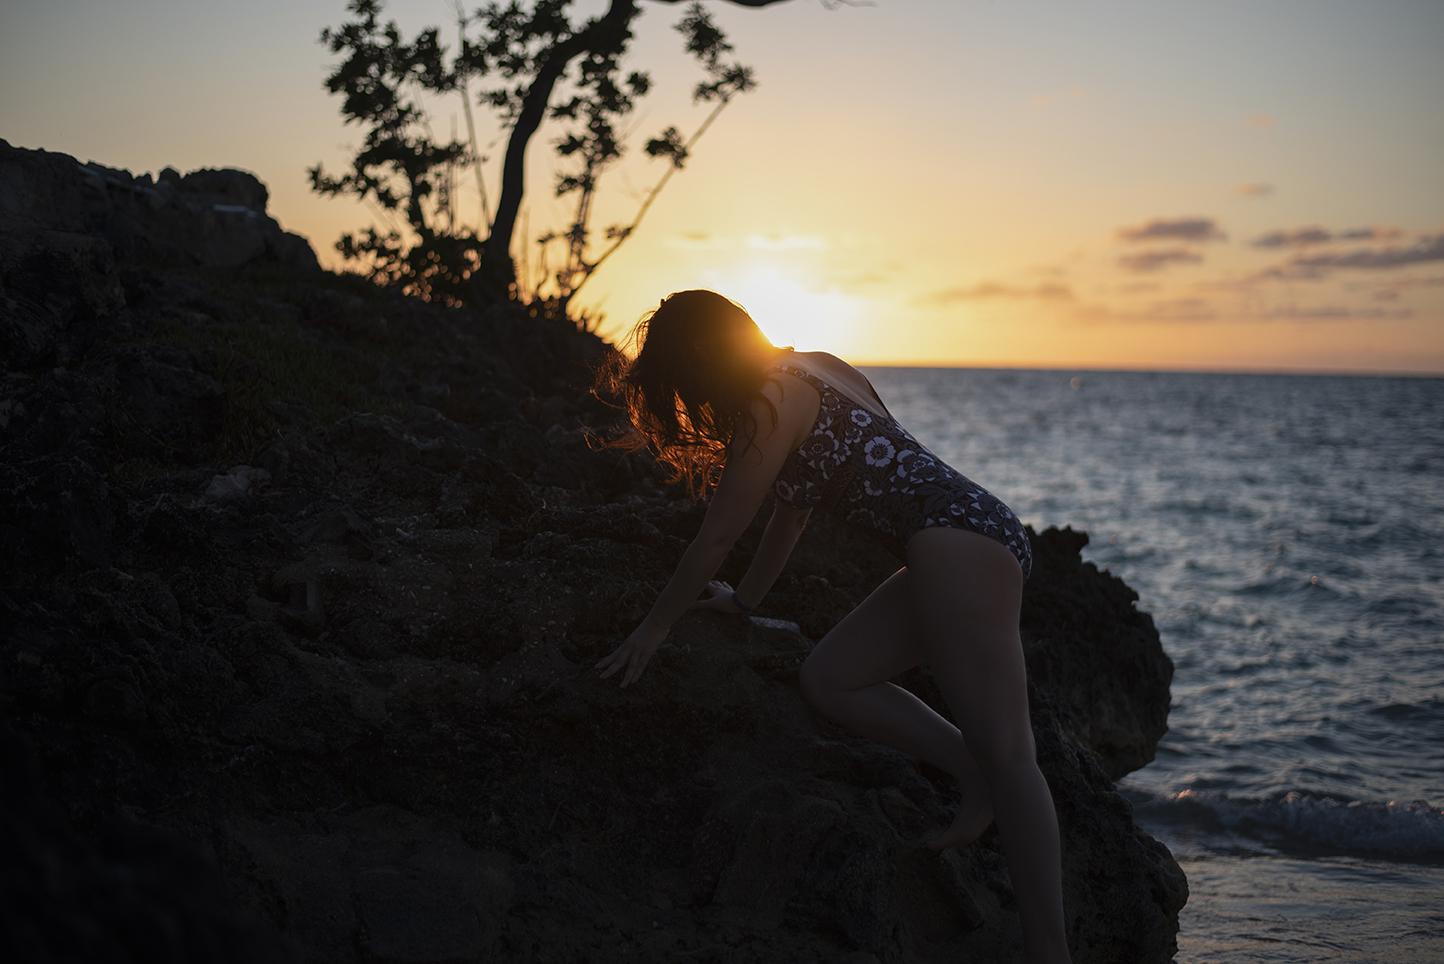 marie-chloe falardeau maillot cuba rocher coucher du soleil